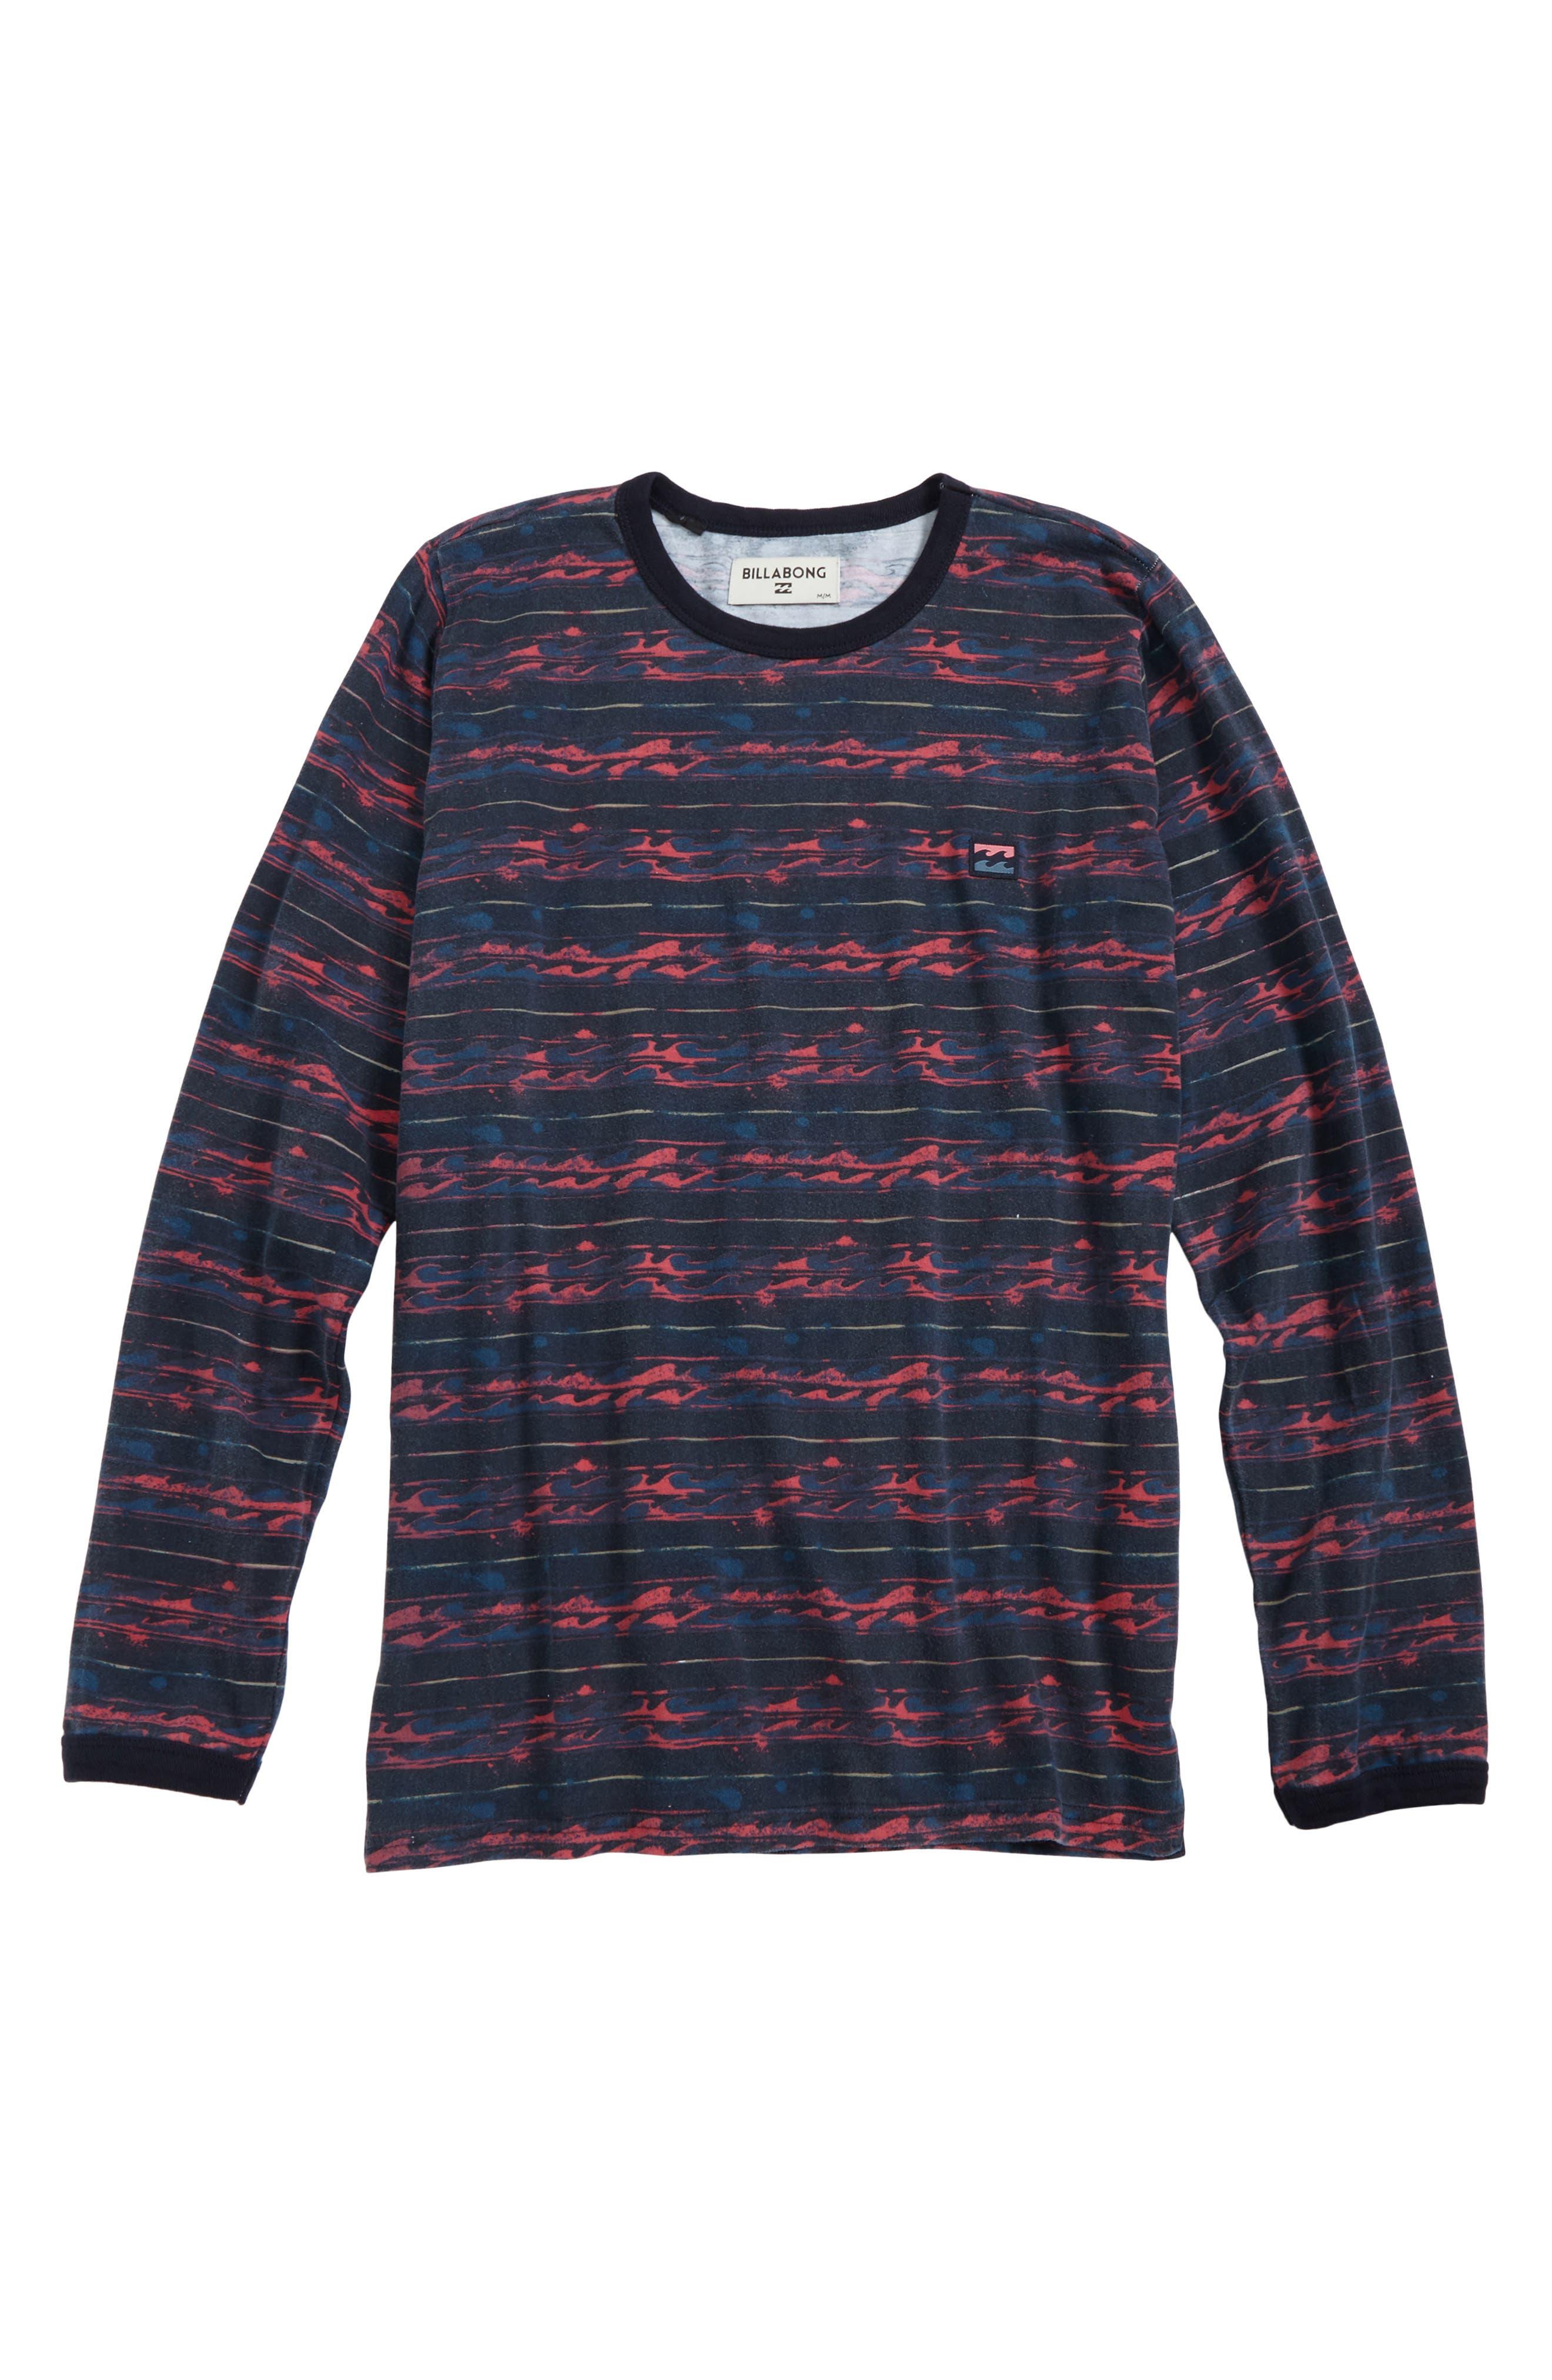 Nelson T-Shirt,                         Main,                         color,